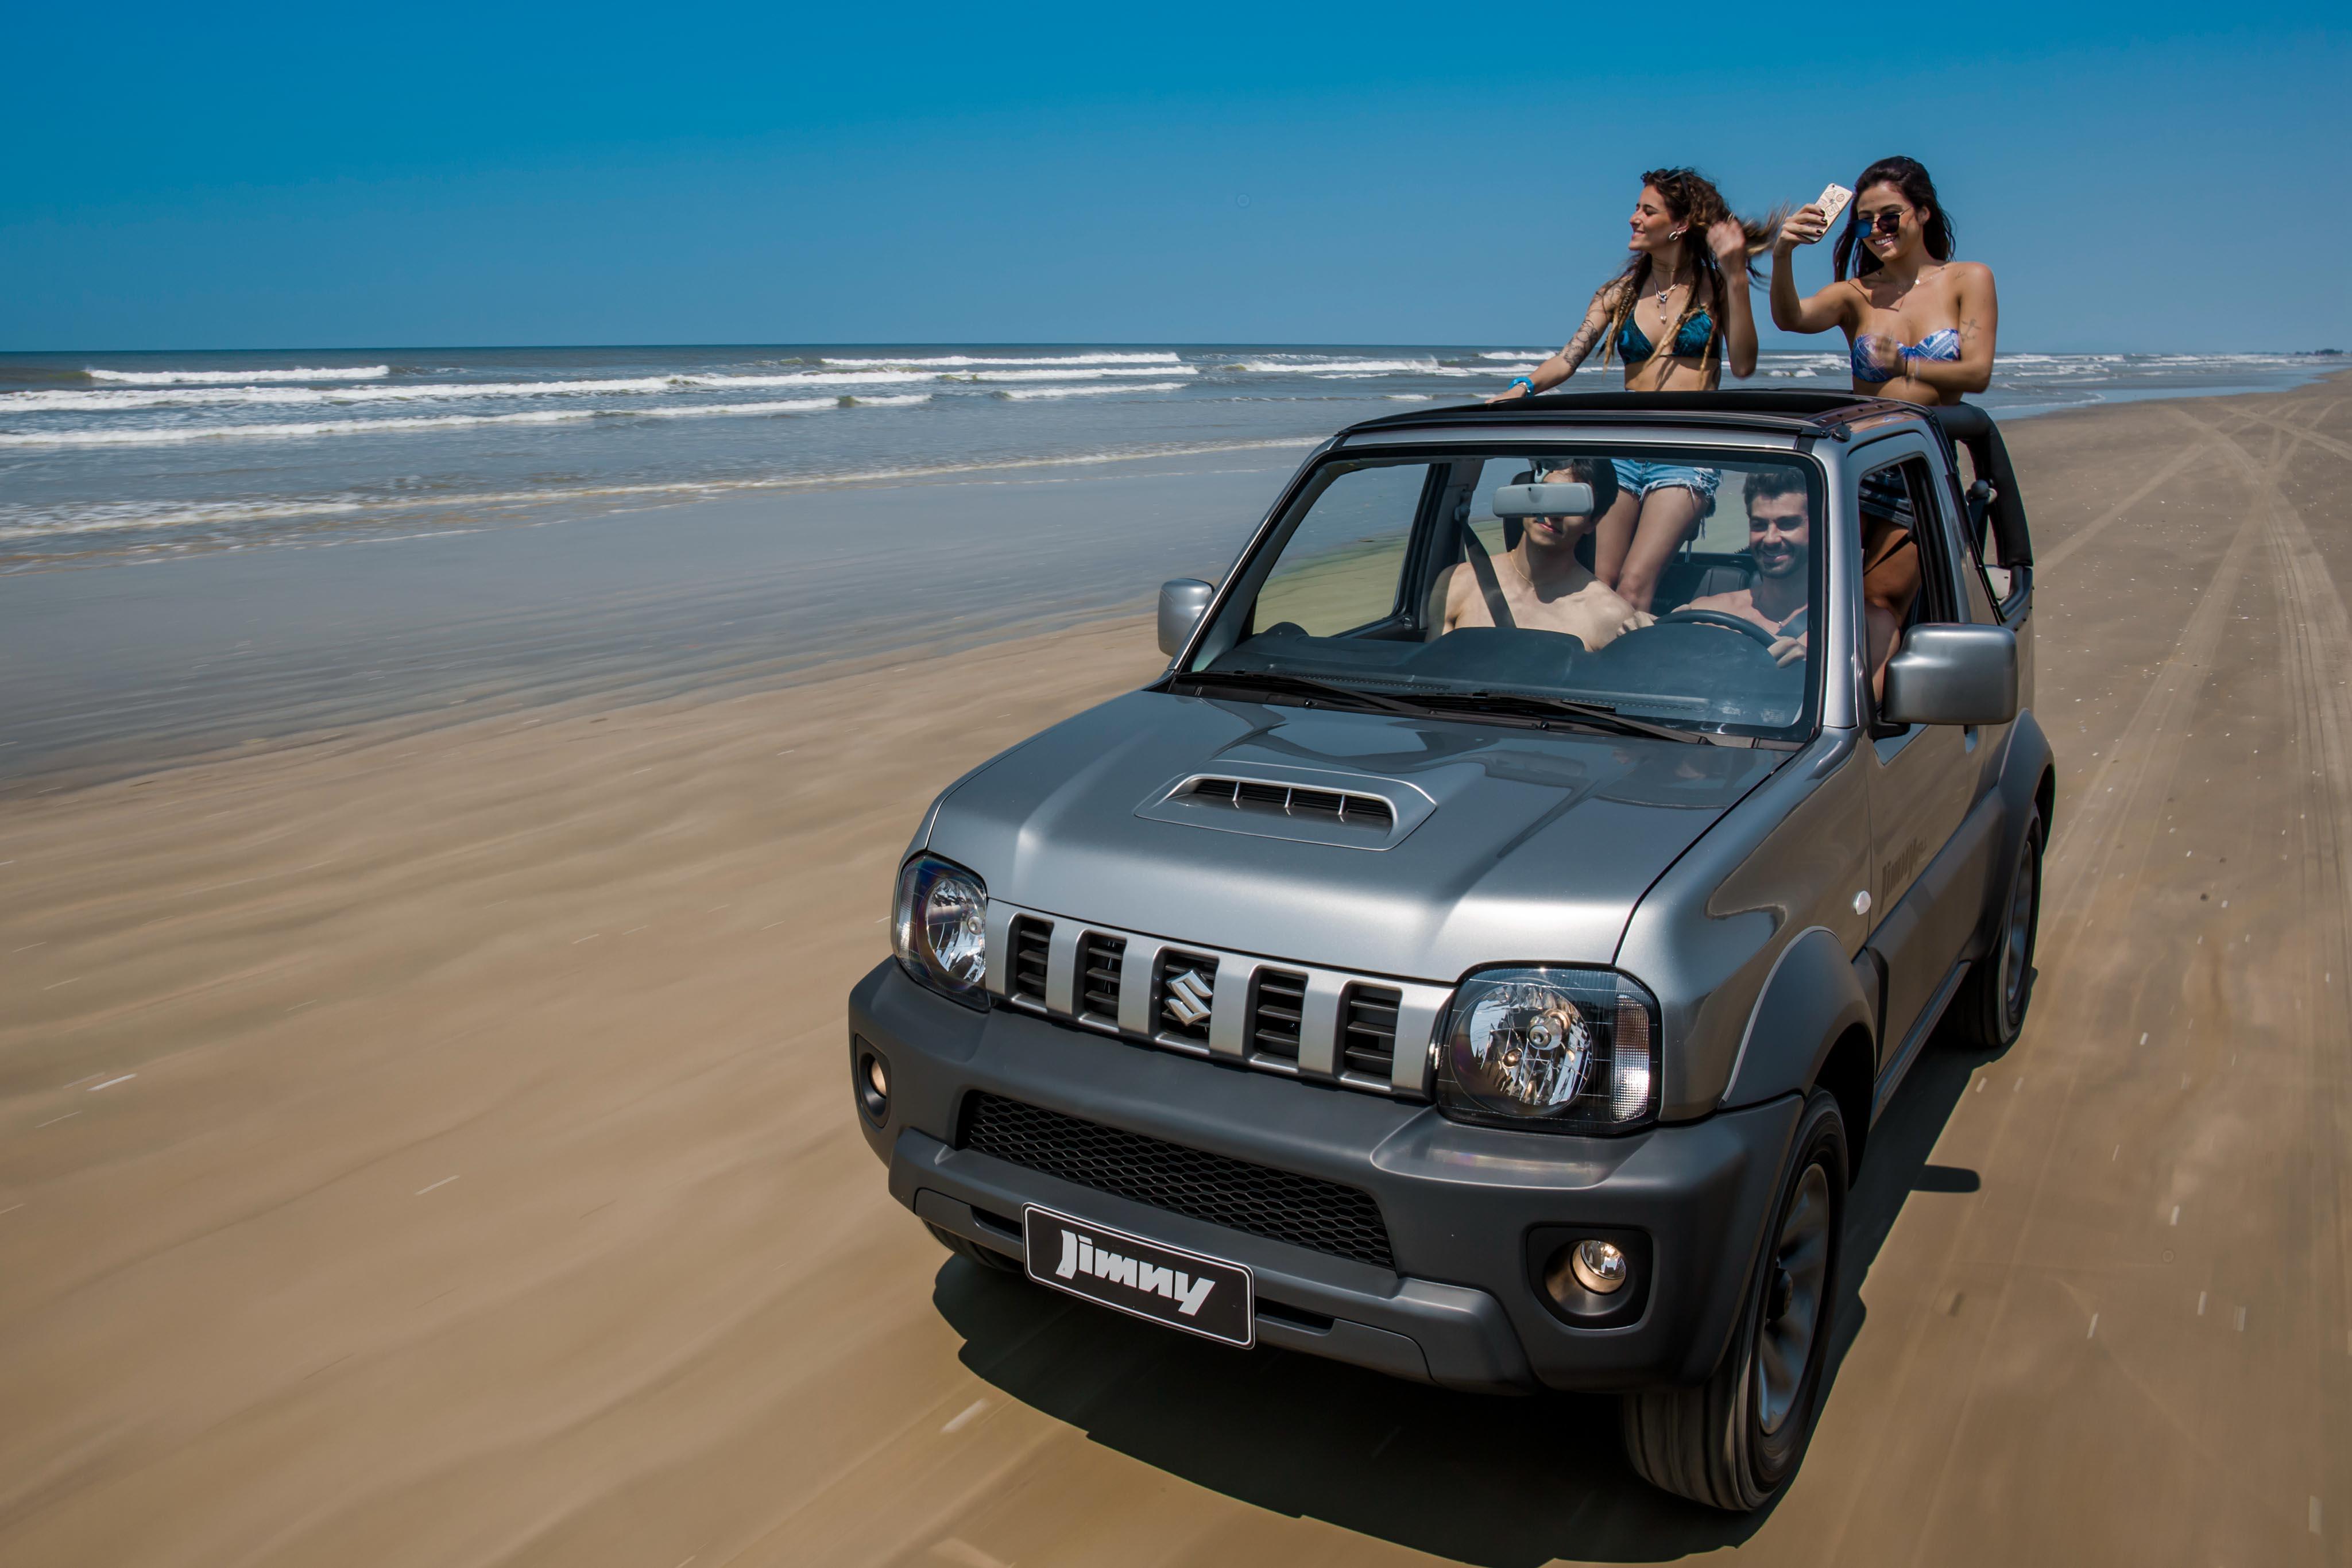 Suzuki Jimny 4ALL Canvas Concept on beach